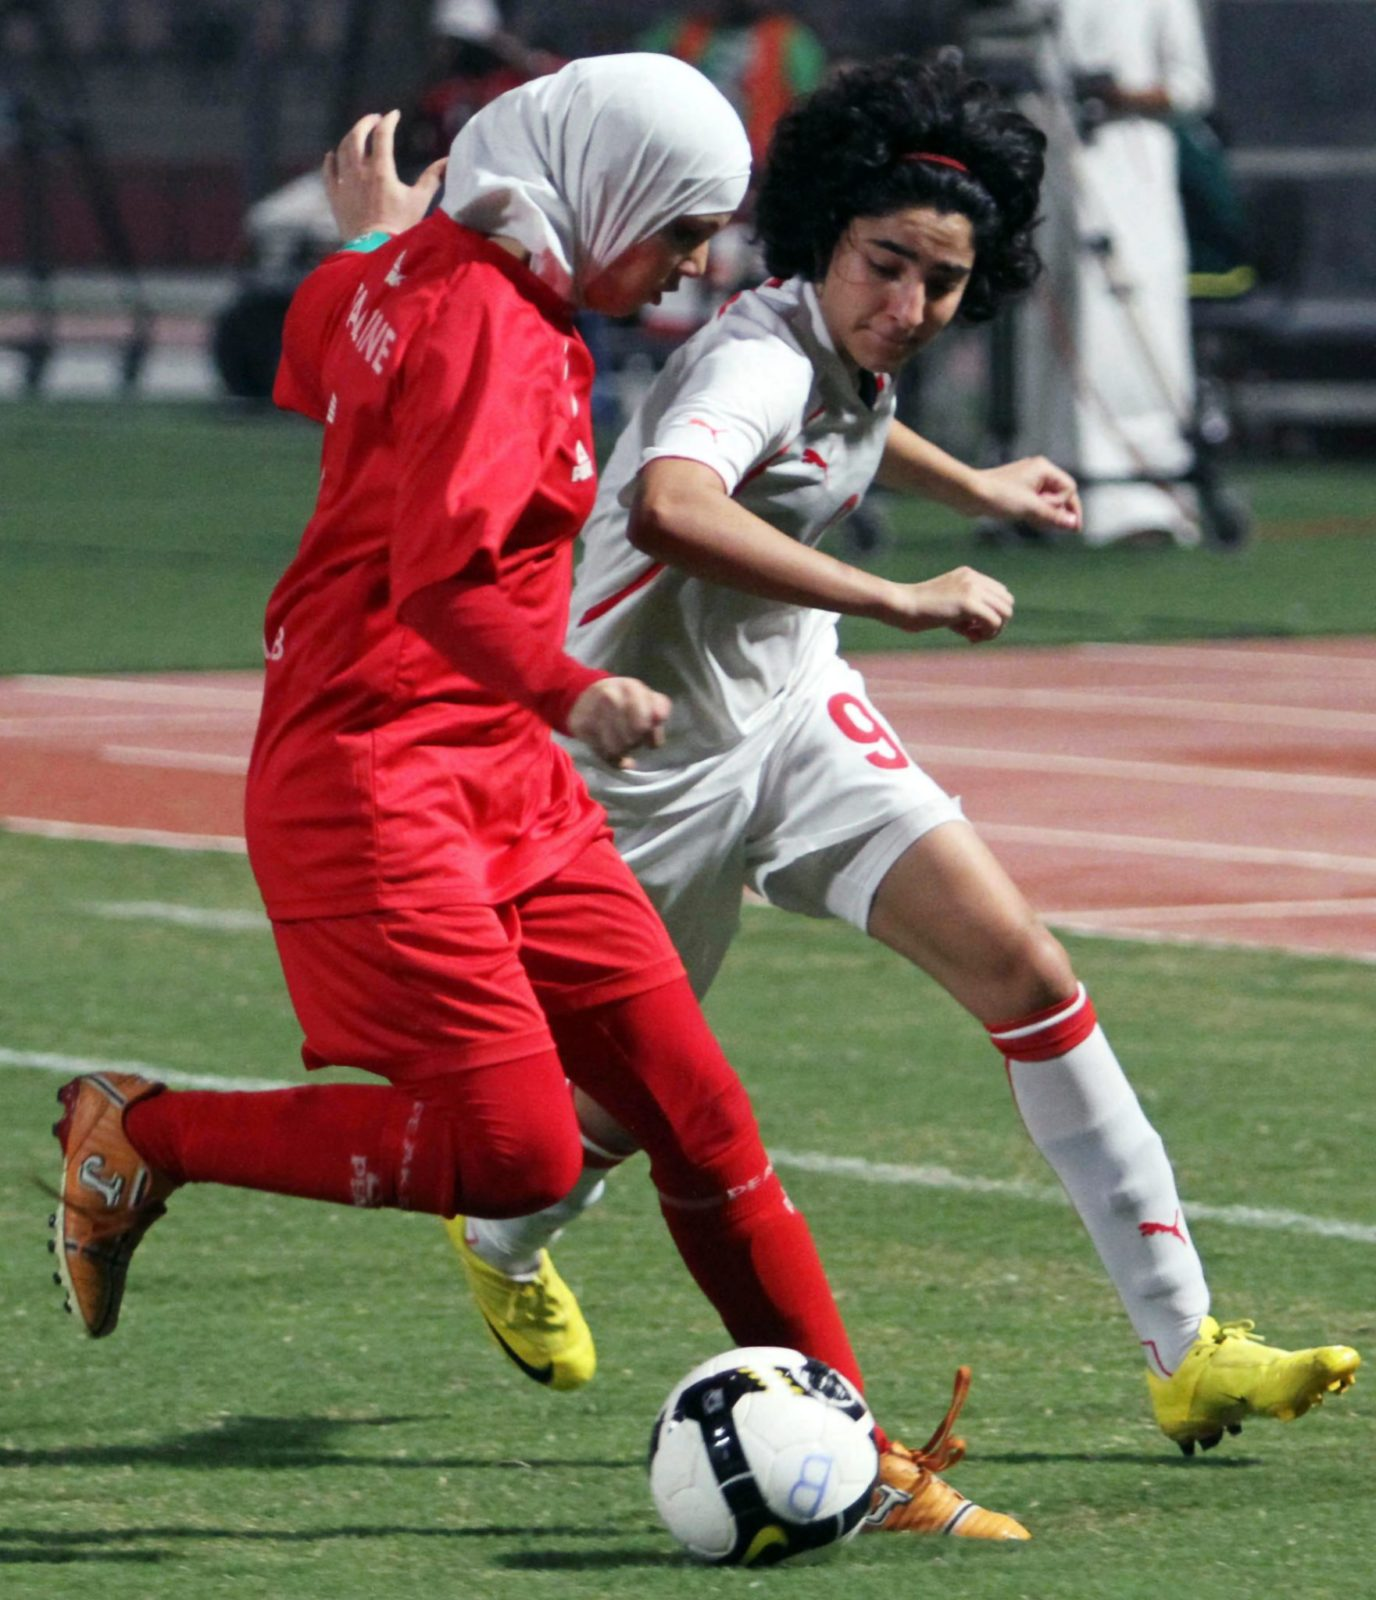 Hijhab scores a goal against FIFA